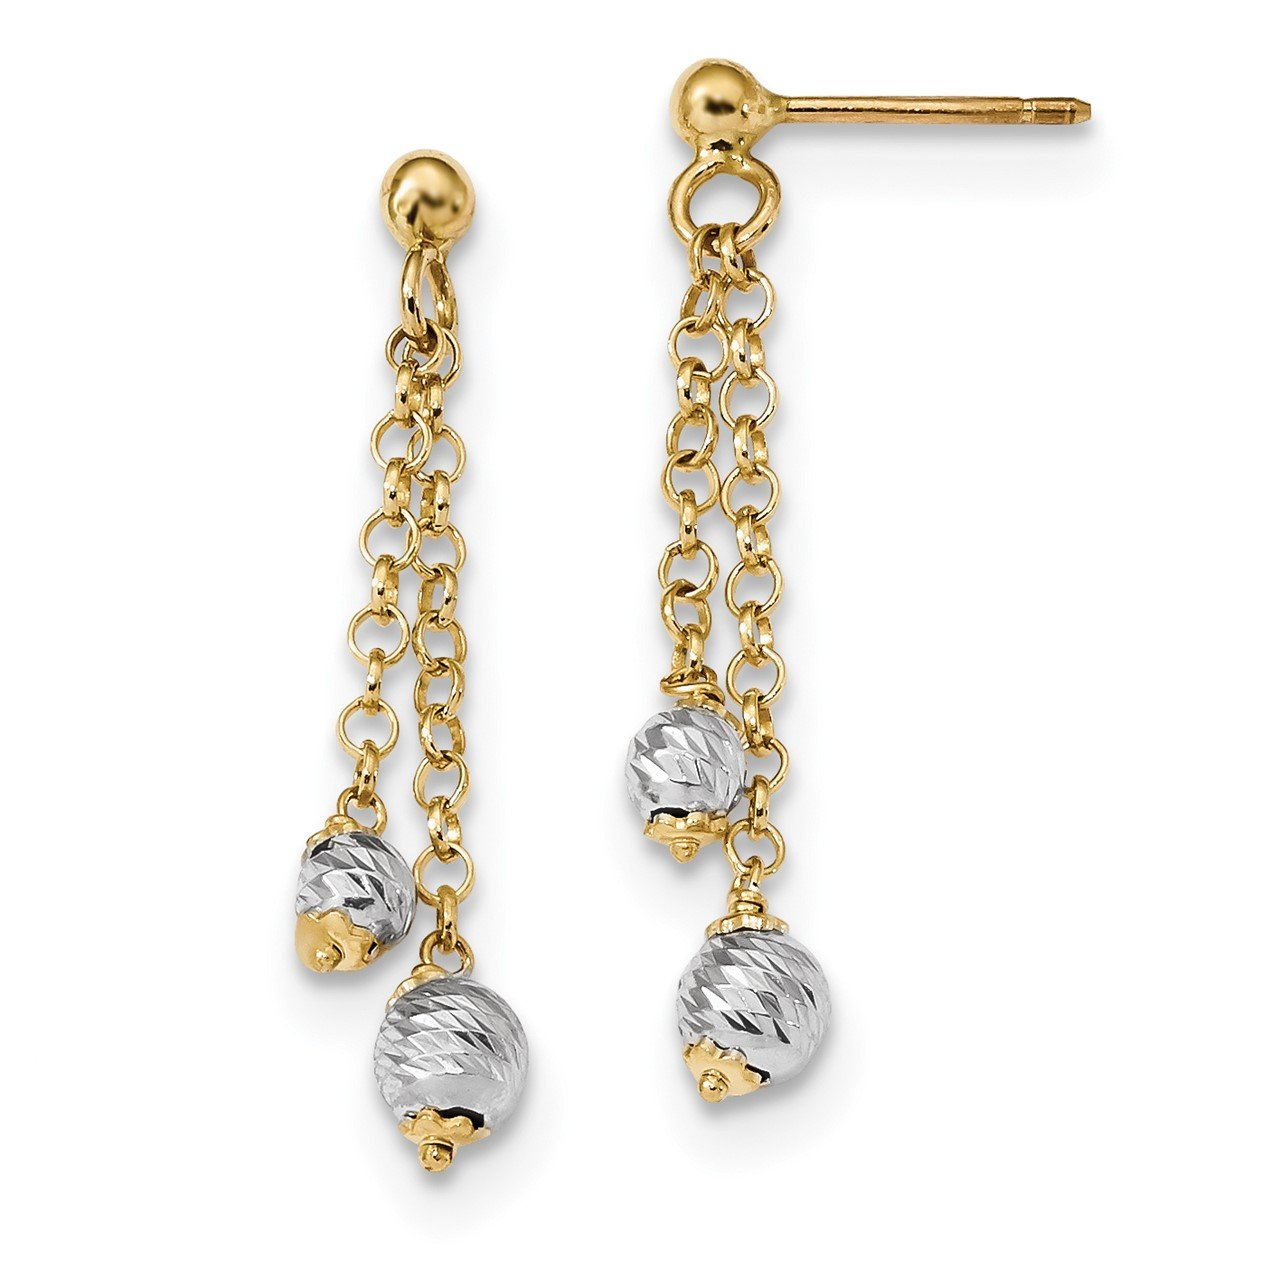 14k Two-tone Polished and D/C Fancy Beaded Dangle Post Earrings